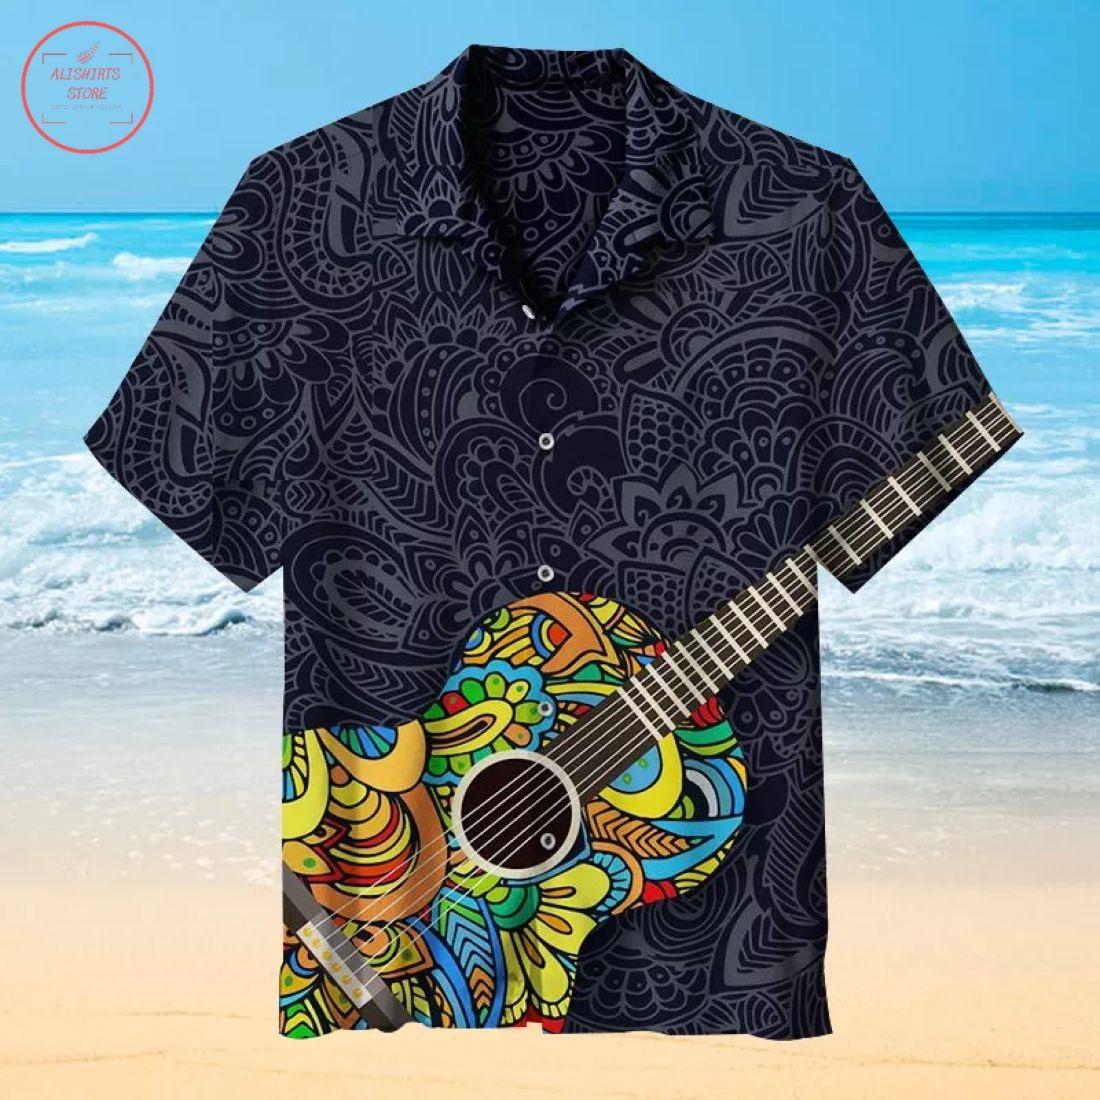 My Favorite Vintage Printed Guitar Hawaiian Shirt